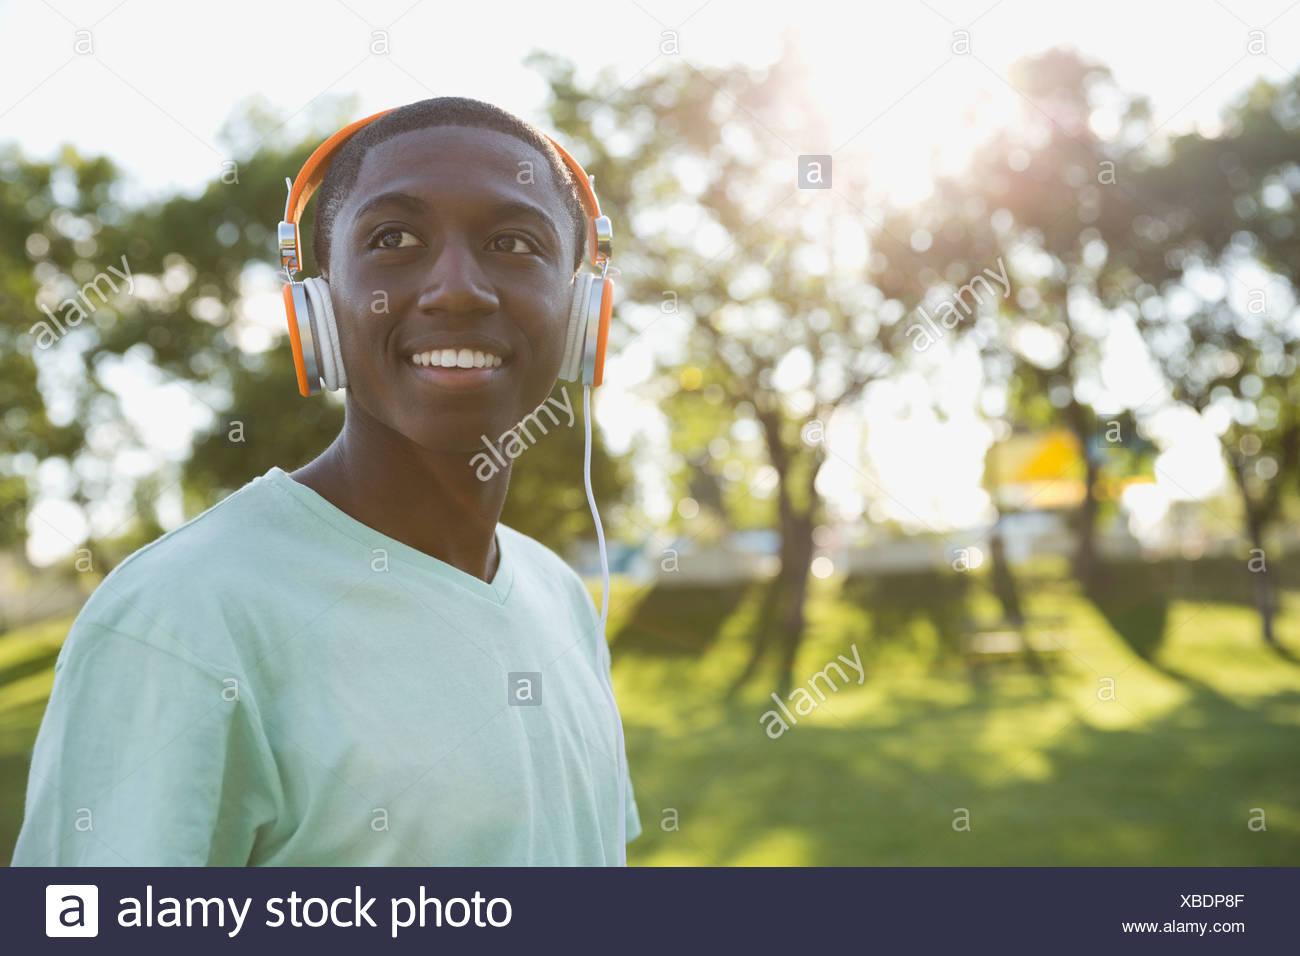 Lächelnde Teenager mit Kopfhörer auf Stockbild